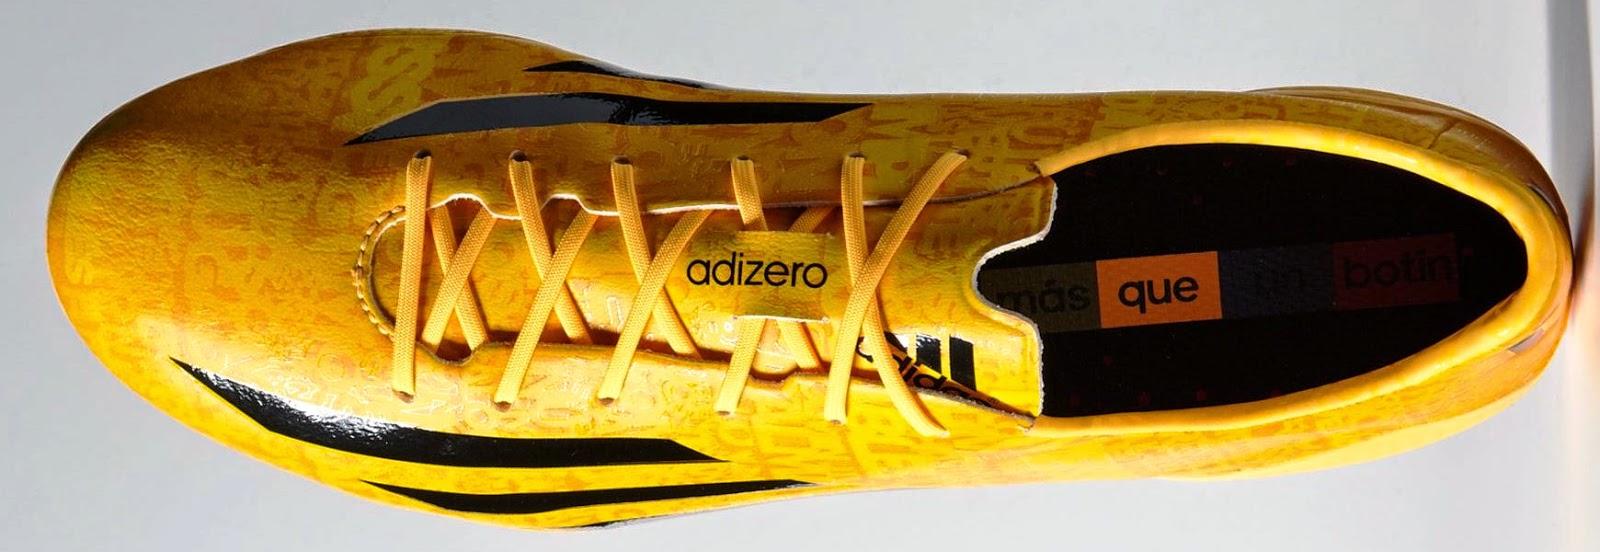 Adidas F50 adiZero 4 Messi Edition - solar gold-black-black - 2.jpg